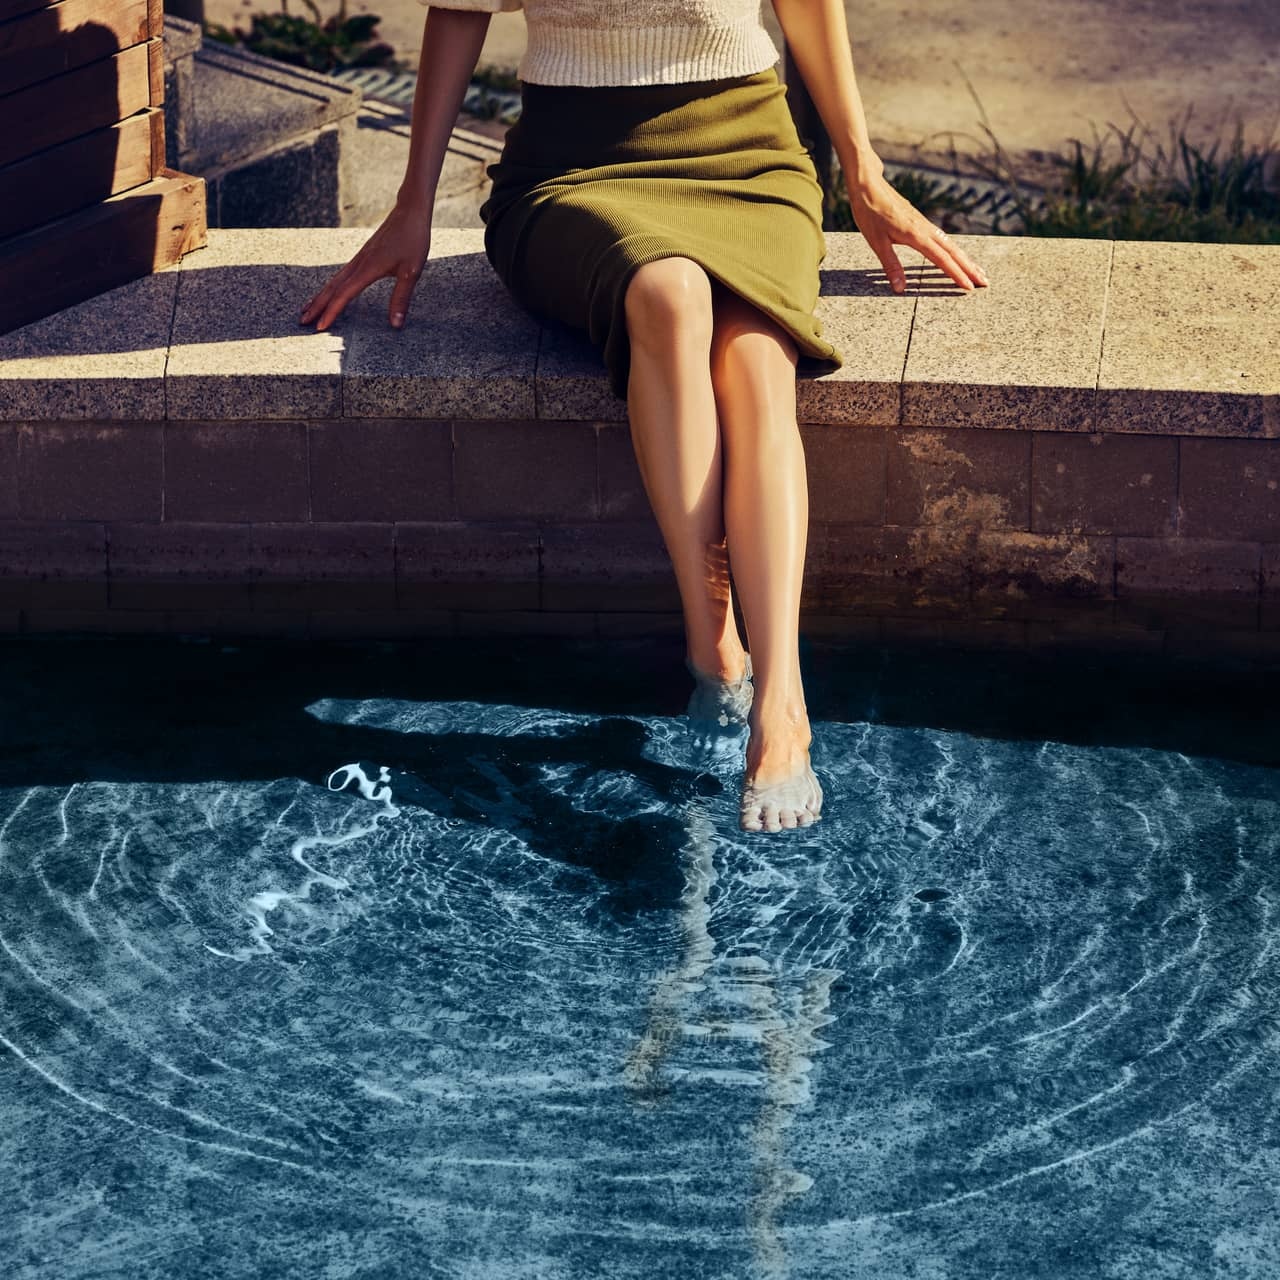 Water Walking- Water Based Exercises